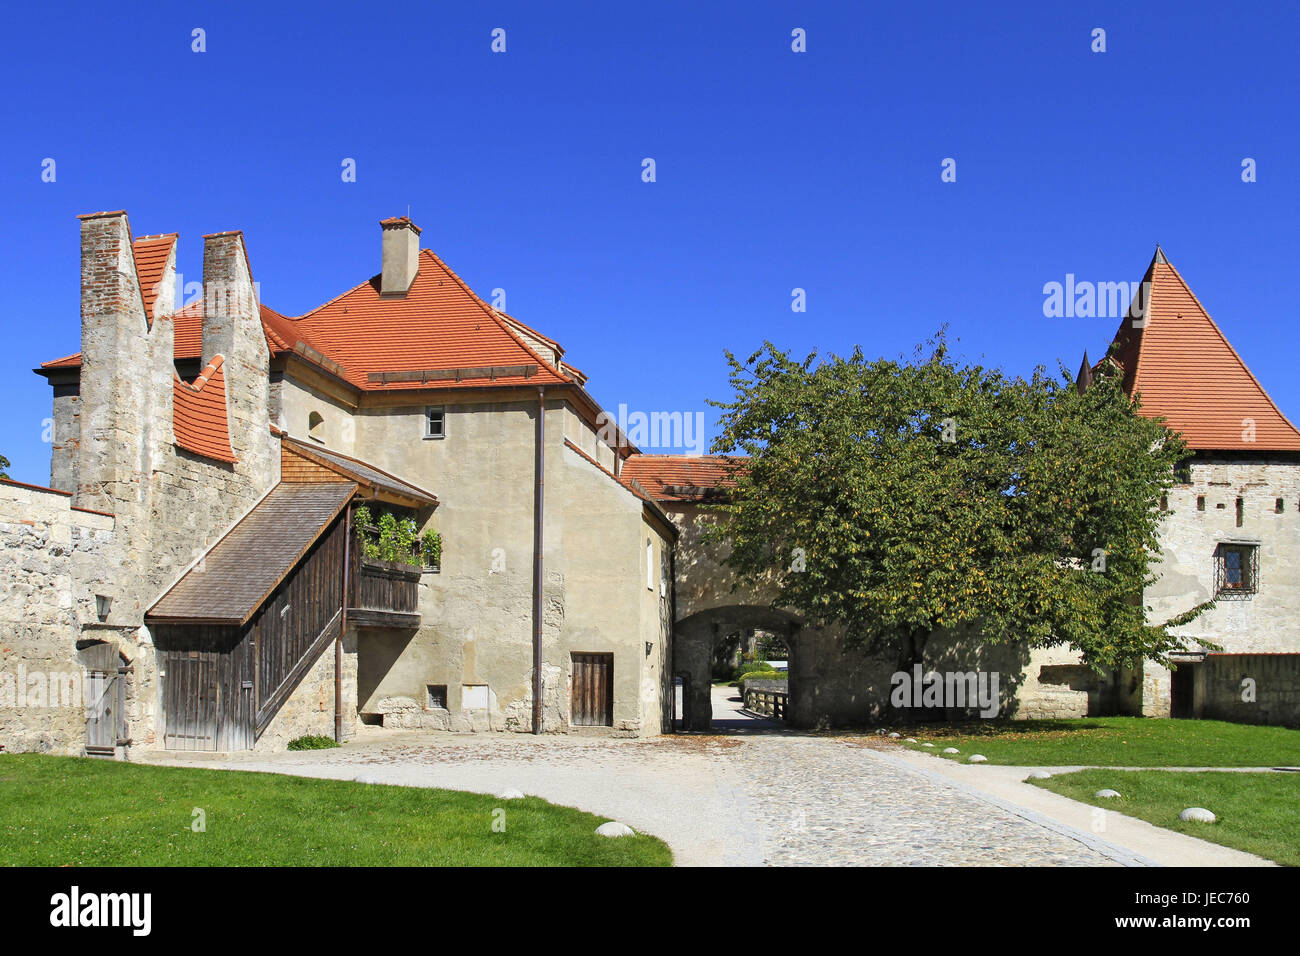 Germany, Bavaria, Burghausen, castle, outside, place of interest, nobody, castle court, Europe, Upper Bavaria, summer, Stock Photo